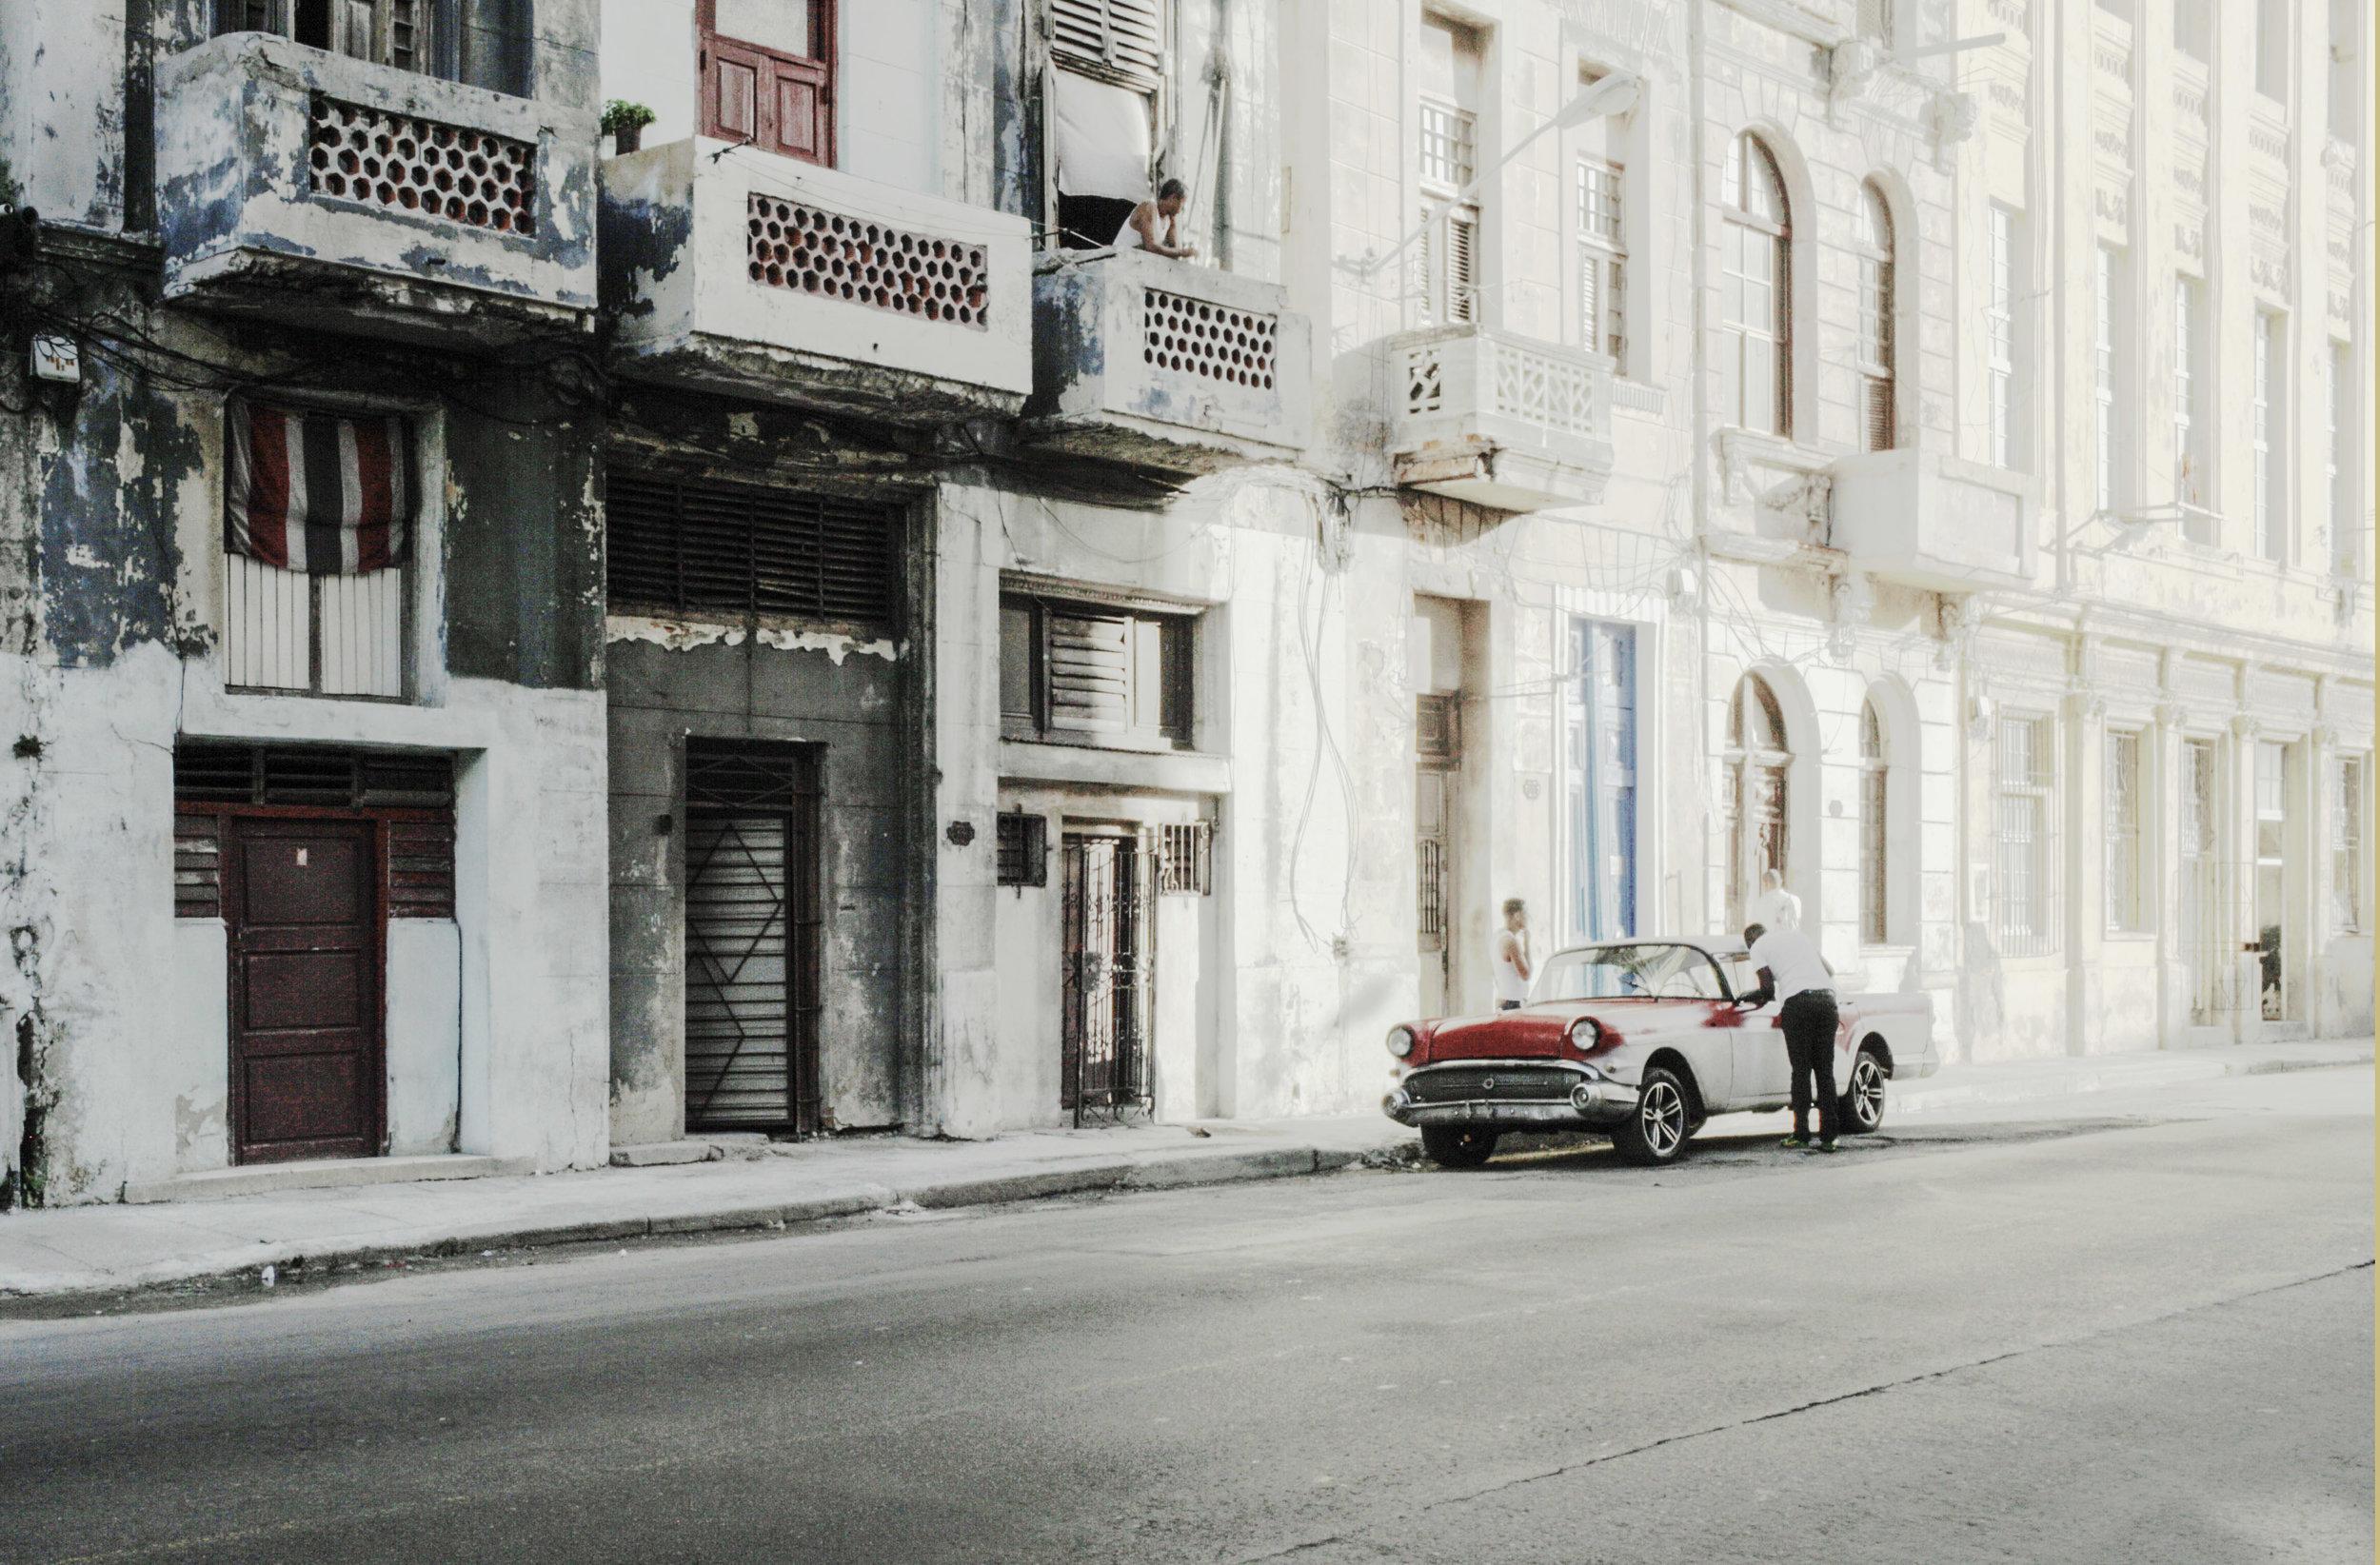 Enzo Obiso,  L'Havana , 2015, stampa fine art giclée, 40 x 50 cm, courtesy Enzo Obiso